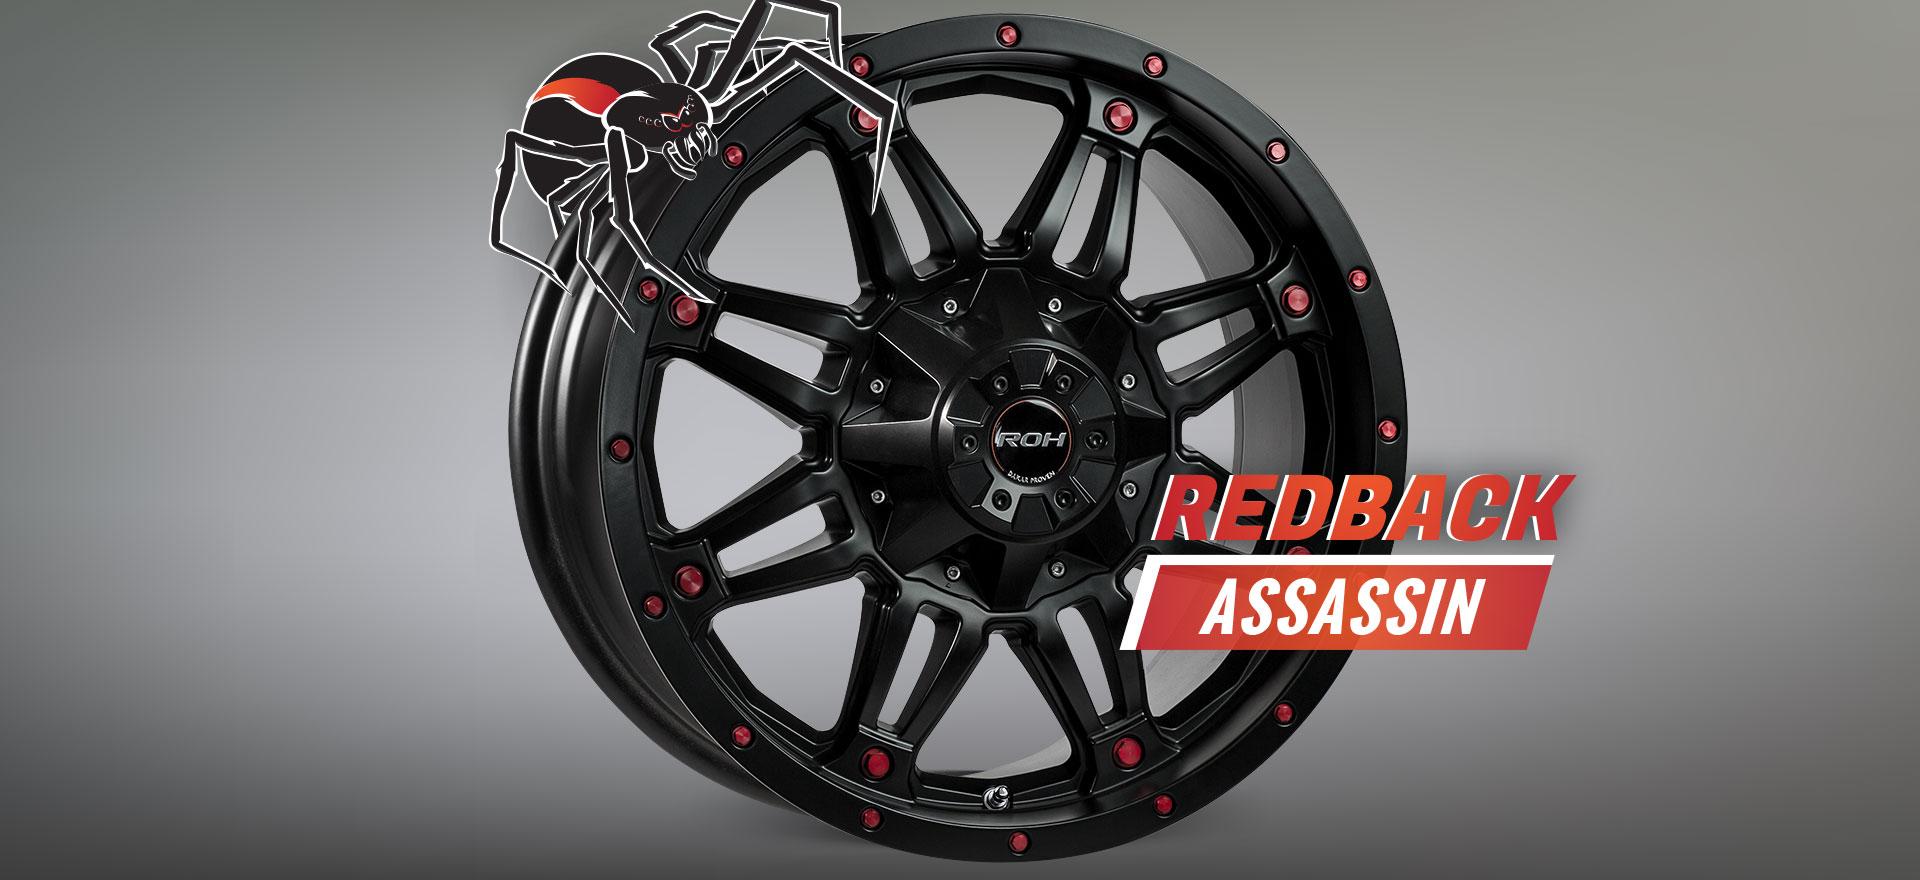 Redback Assassin with Spider